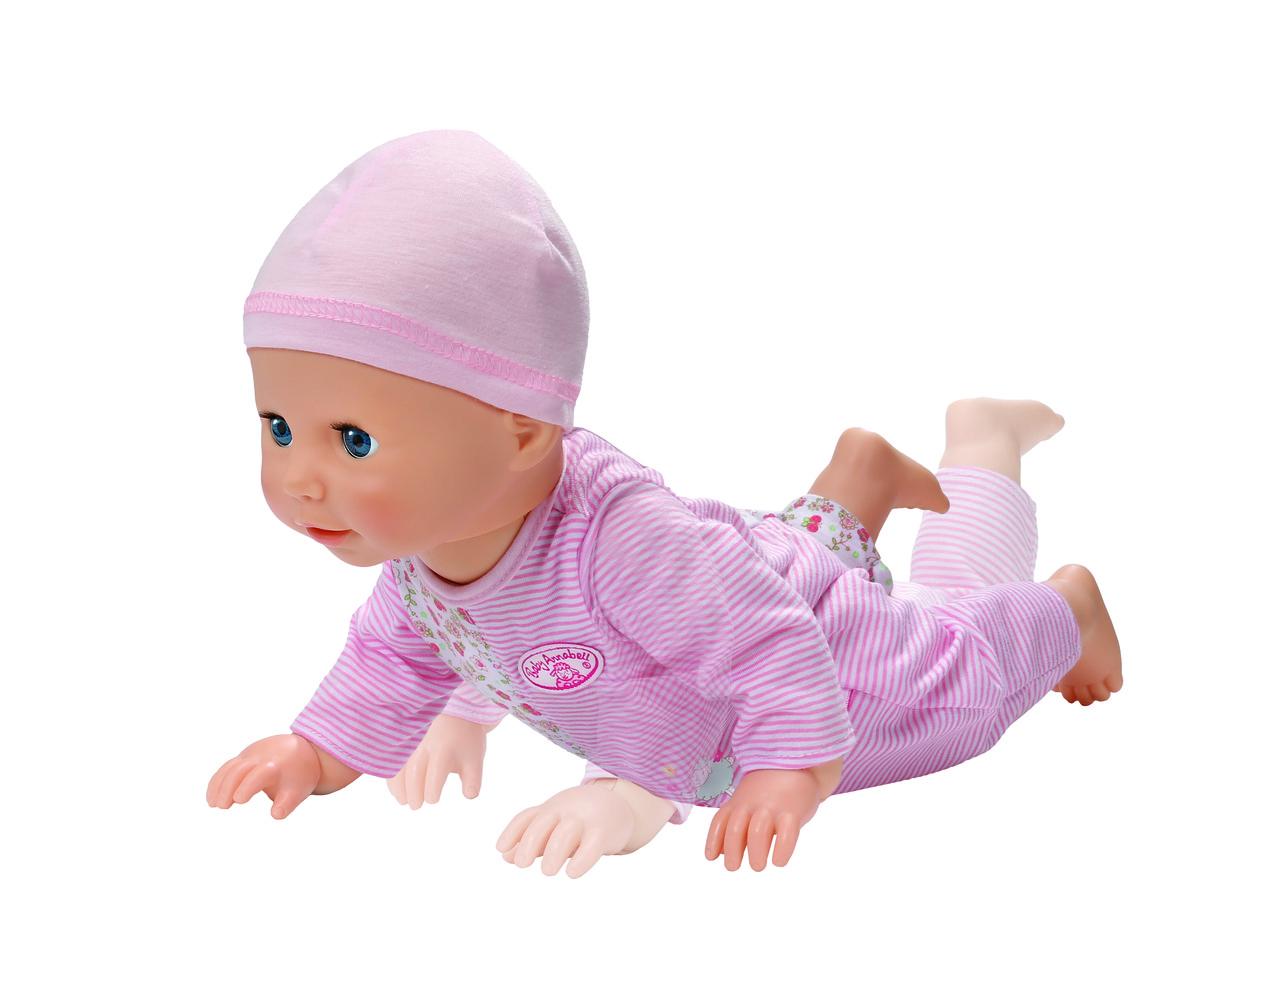 Кукла пупс Baby Annabell Беби Анабель интерактивная Первые шаги оригинал Zapf Creation 793411